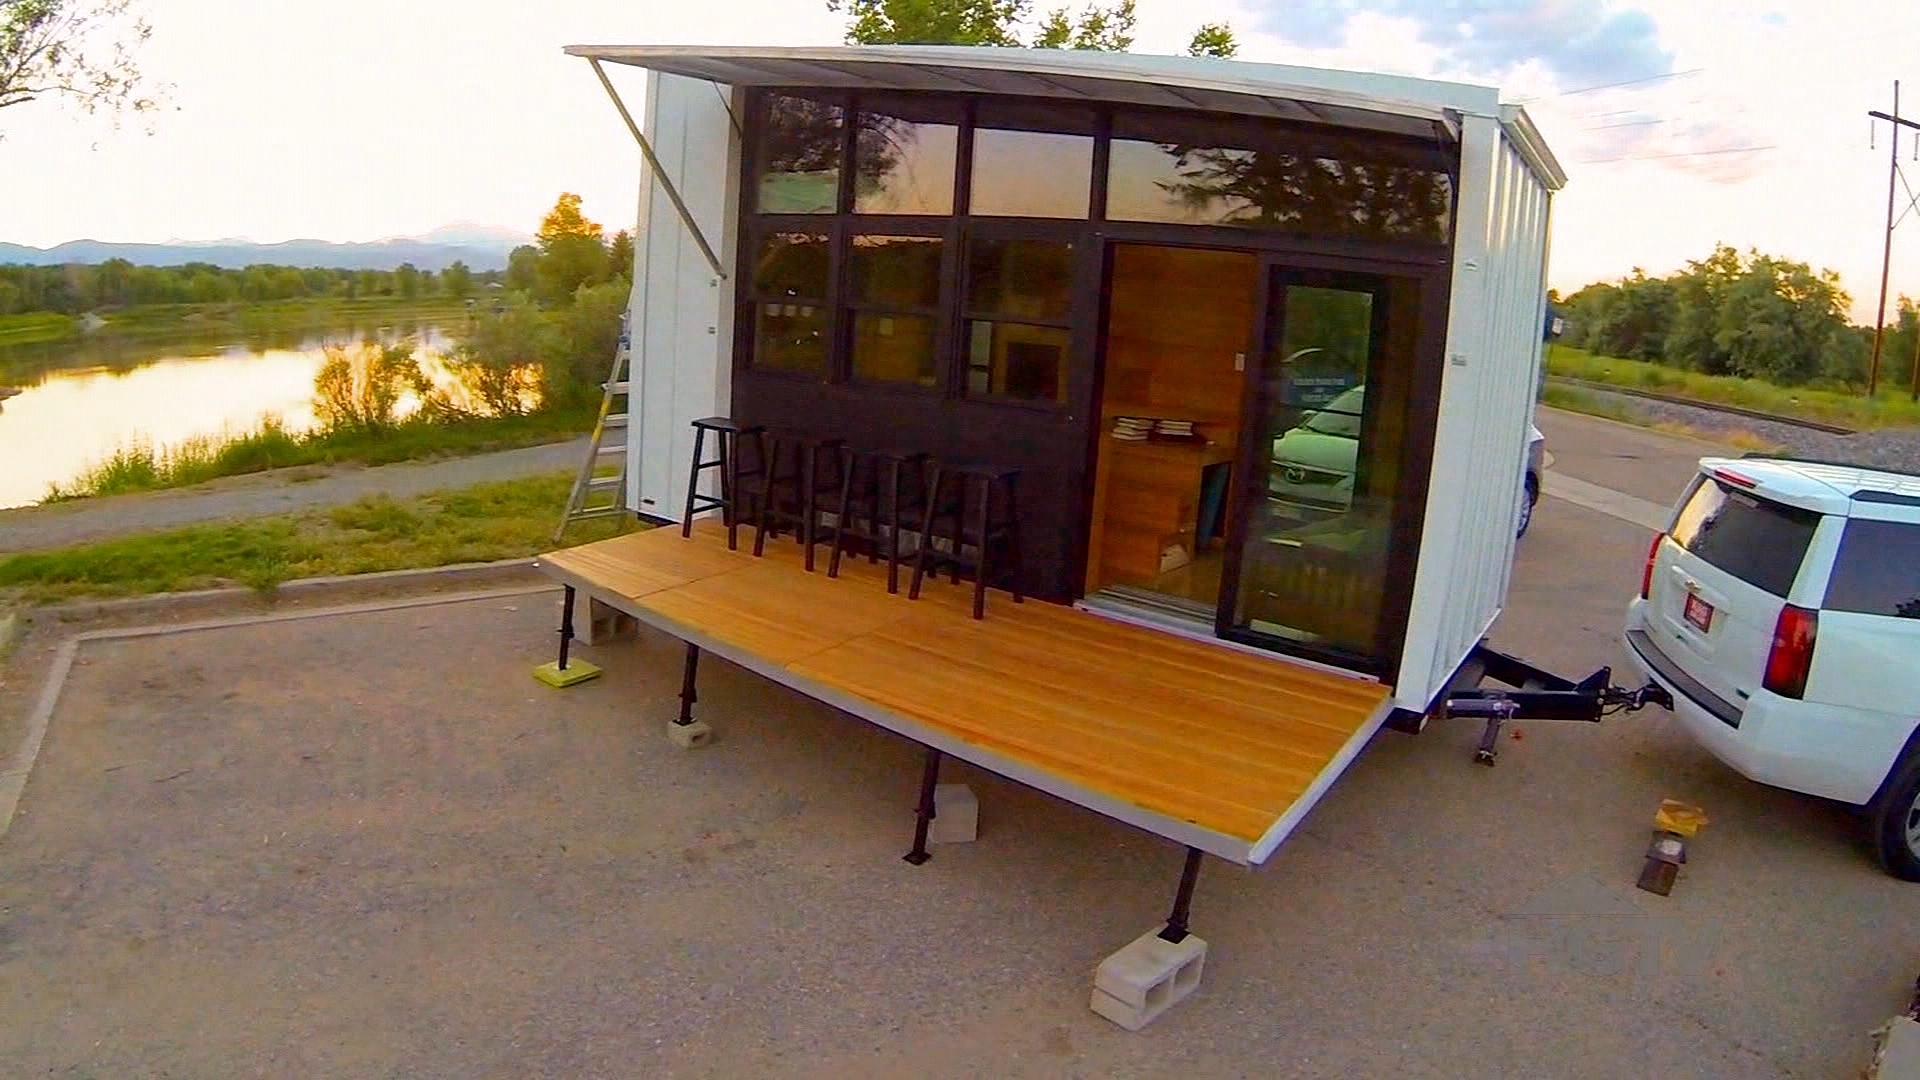 tiny house big living video tiny pool house season 08 episode 03. Black Bedroom Furniture Sets. Home Design Ideas